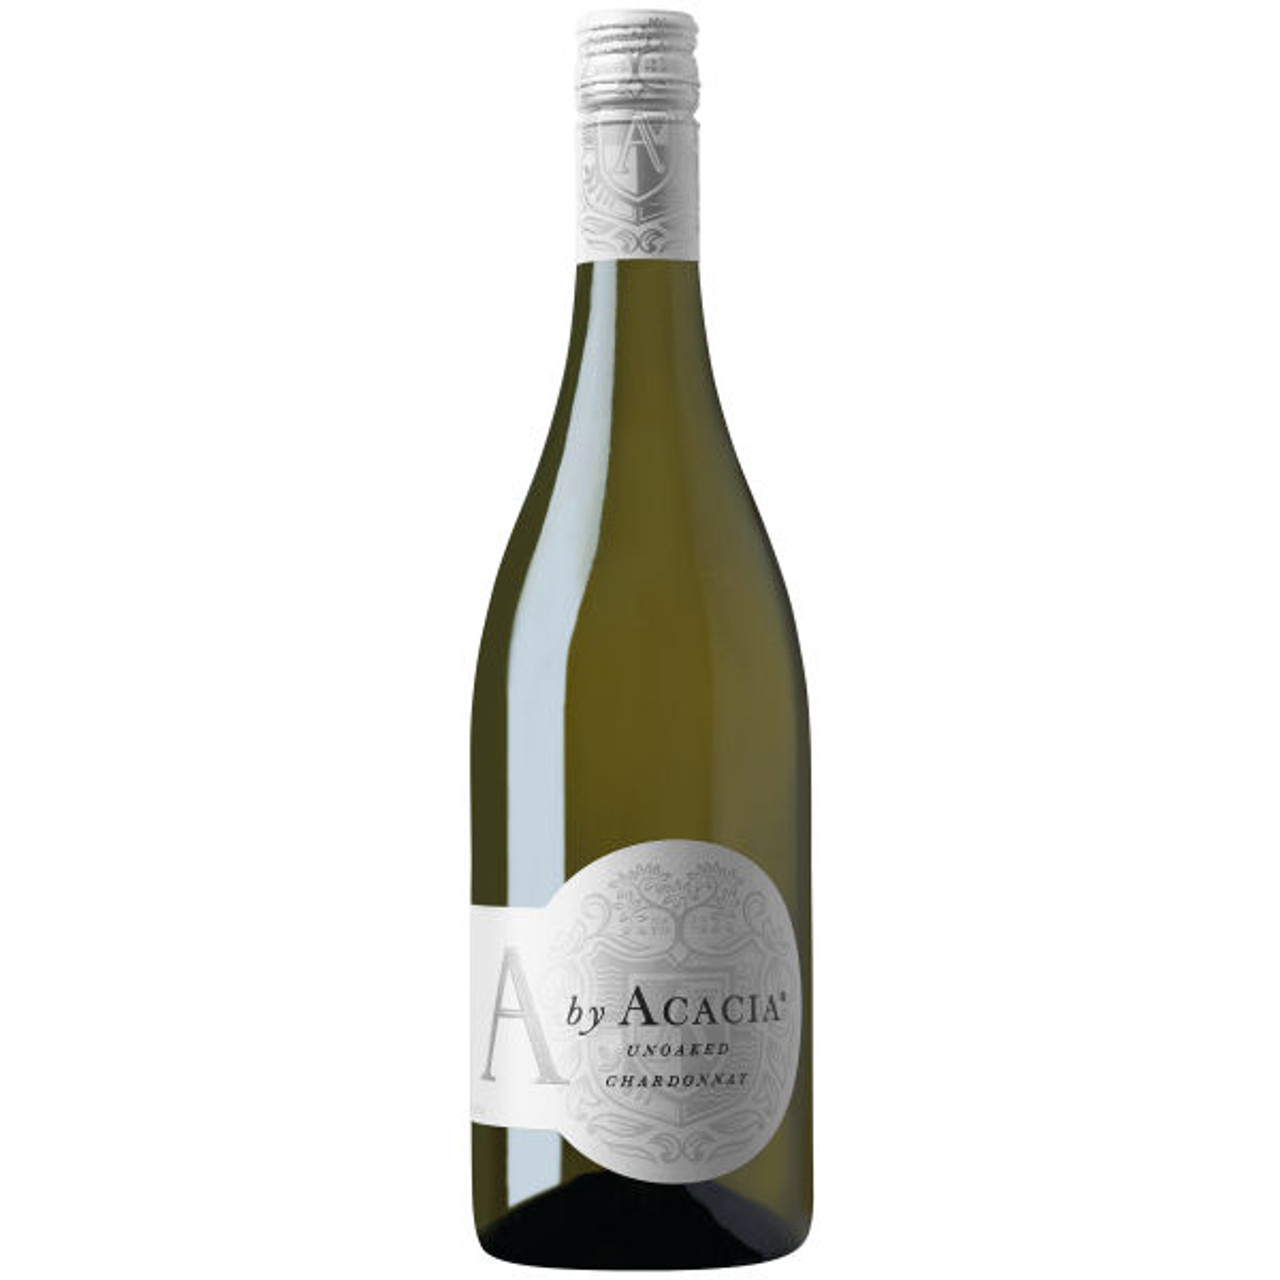 A by Acacia California Unoaked Chardonnay